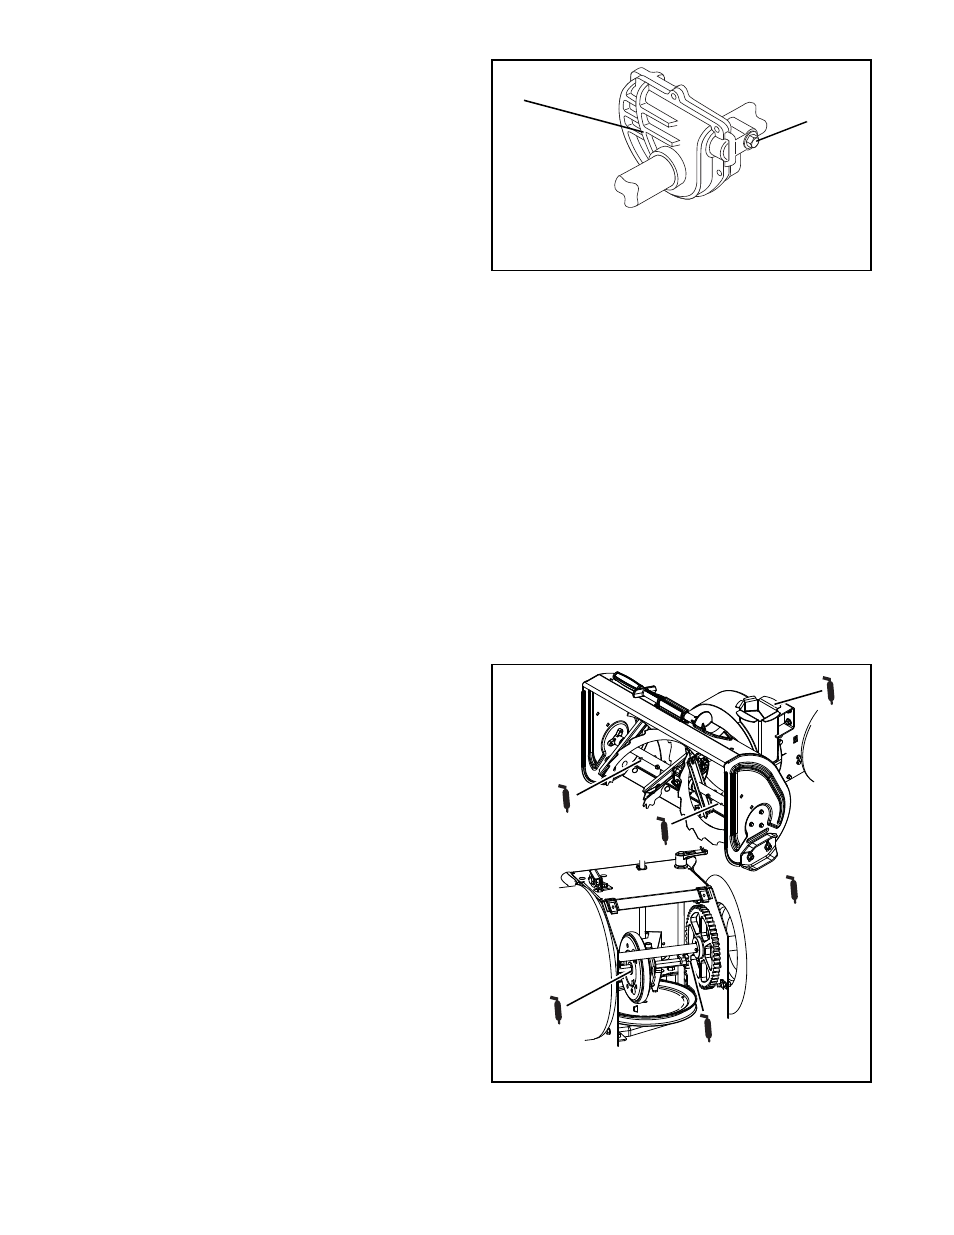 medium resolution of jacks small engines array ariens sno thro 920001 st624e user manual page 15 26 rh manualsdir